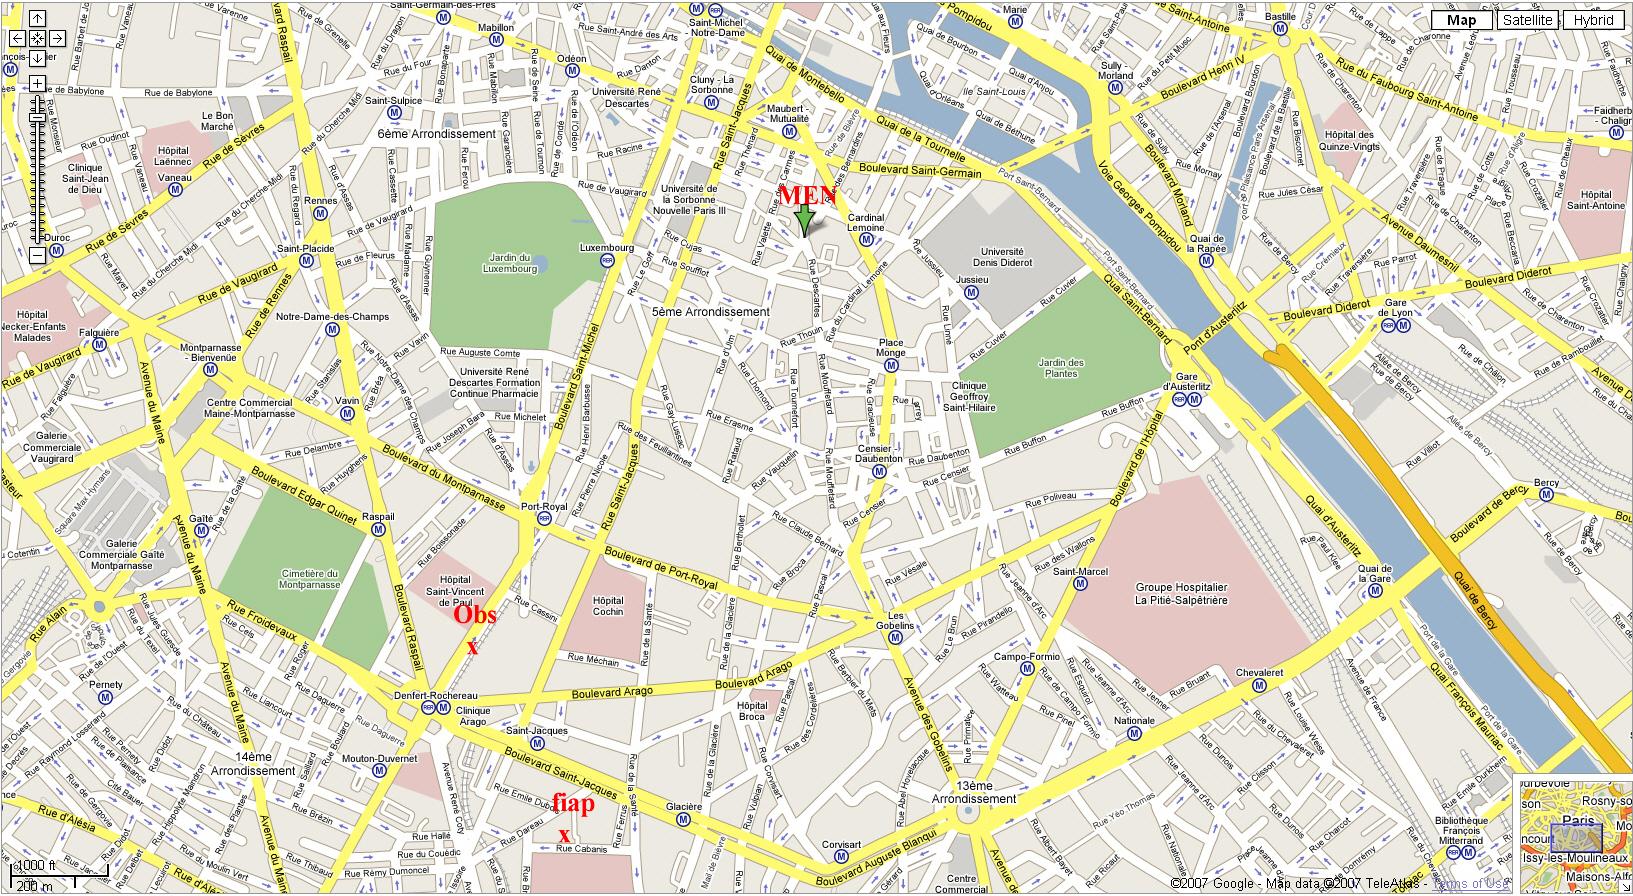 Printable Street Map Of Paris Download Printable Paris Street Map - Printable Map Of Paris France